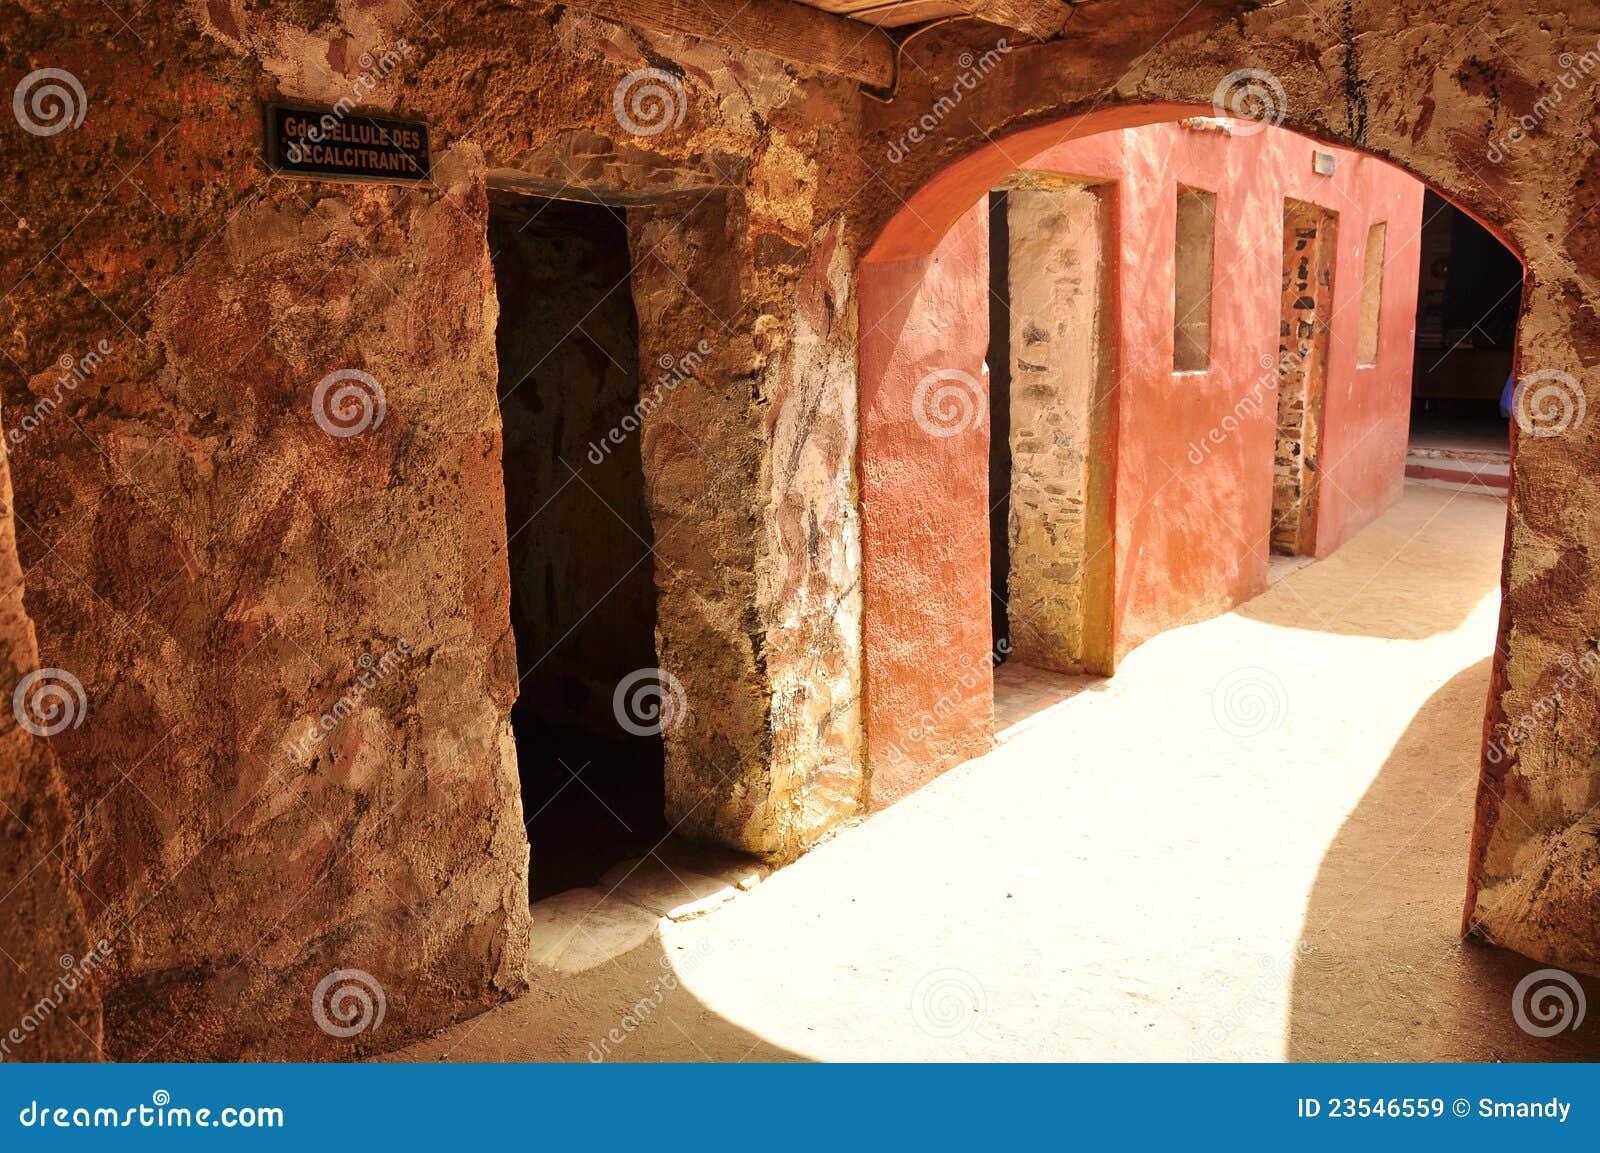 Räume der Sklaven, Haus der Sklaven, Senegal